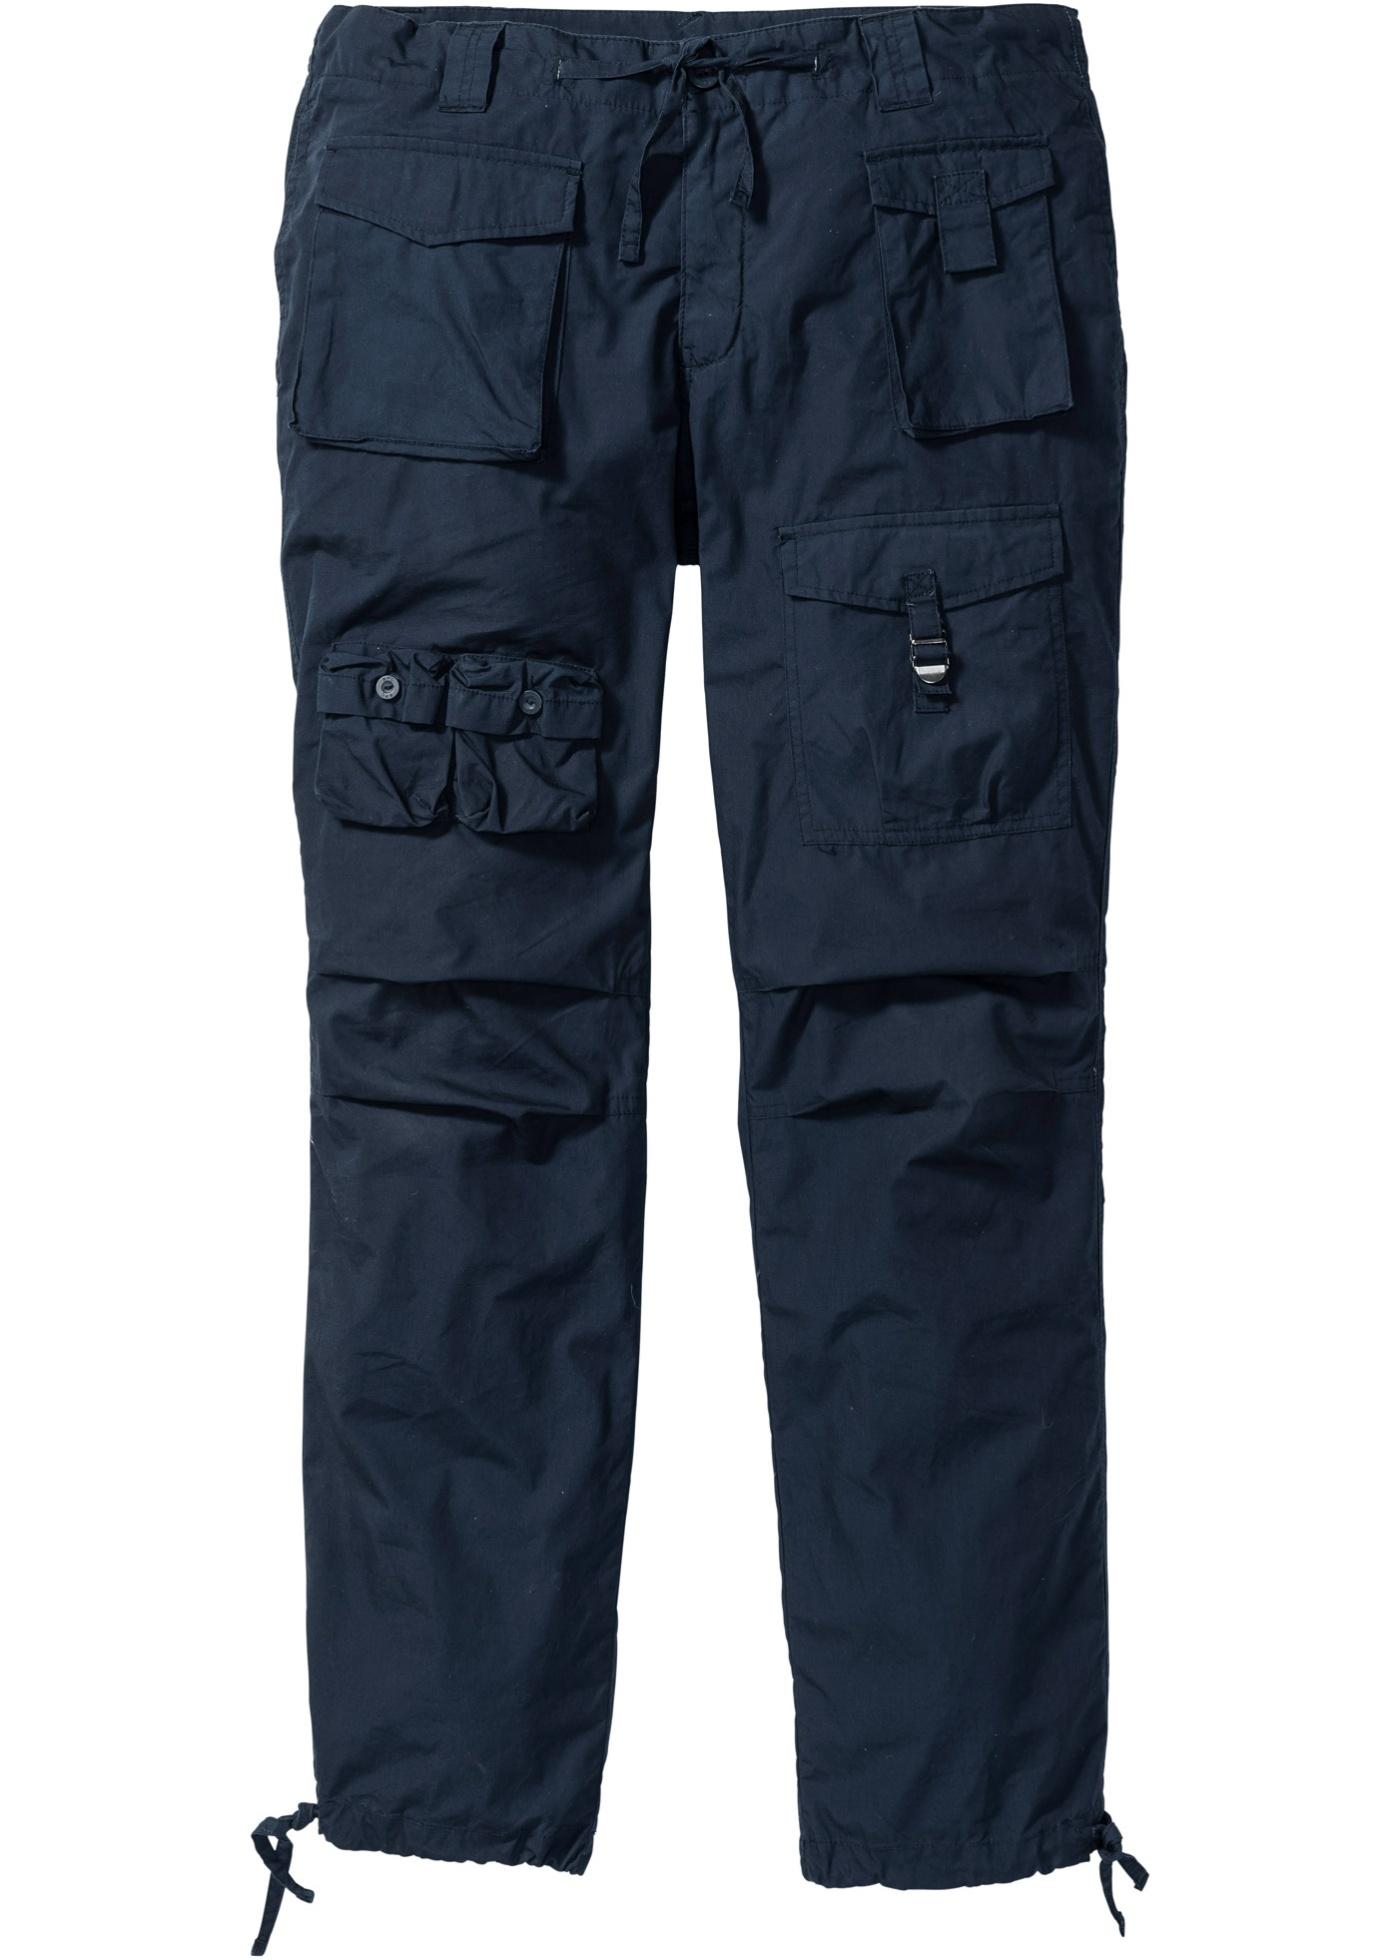 Kargo kalhoty Loose Fit - Modrá